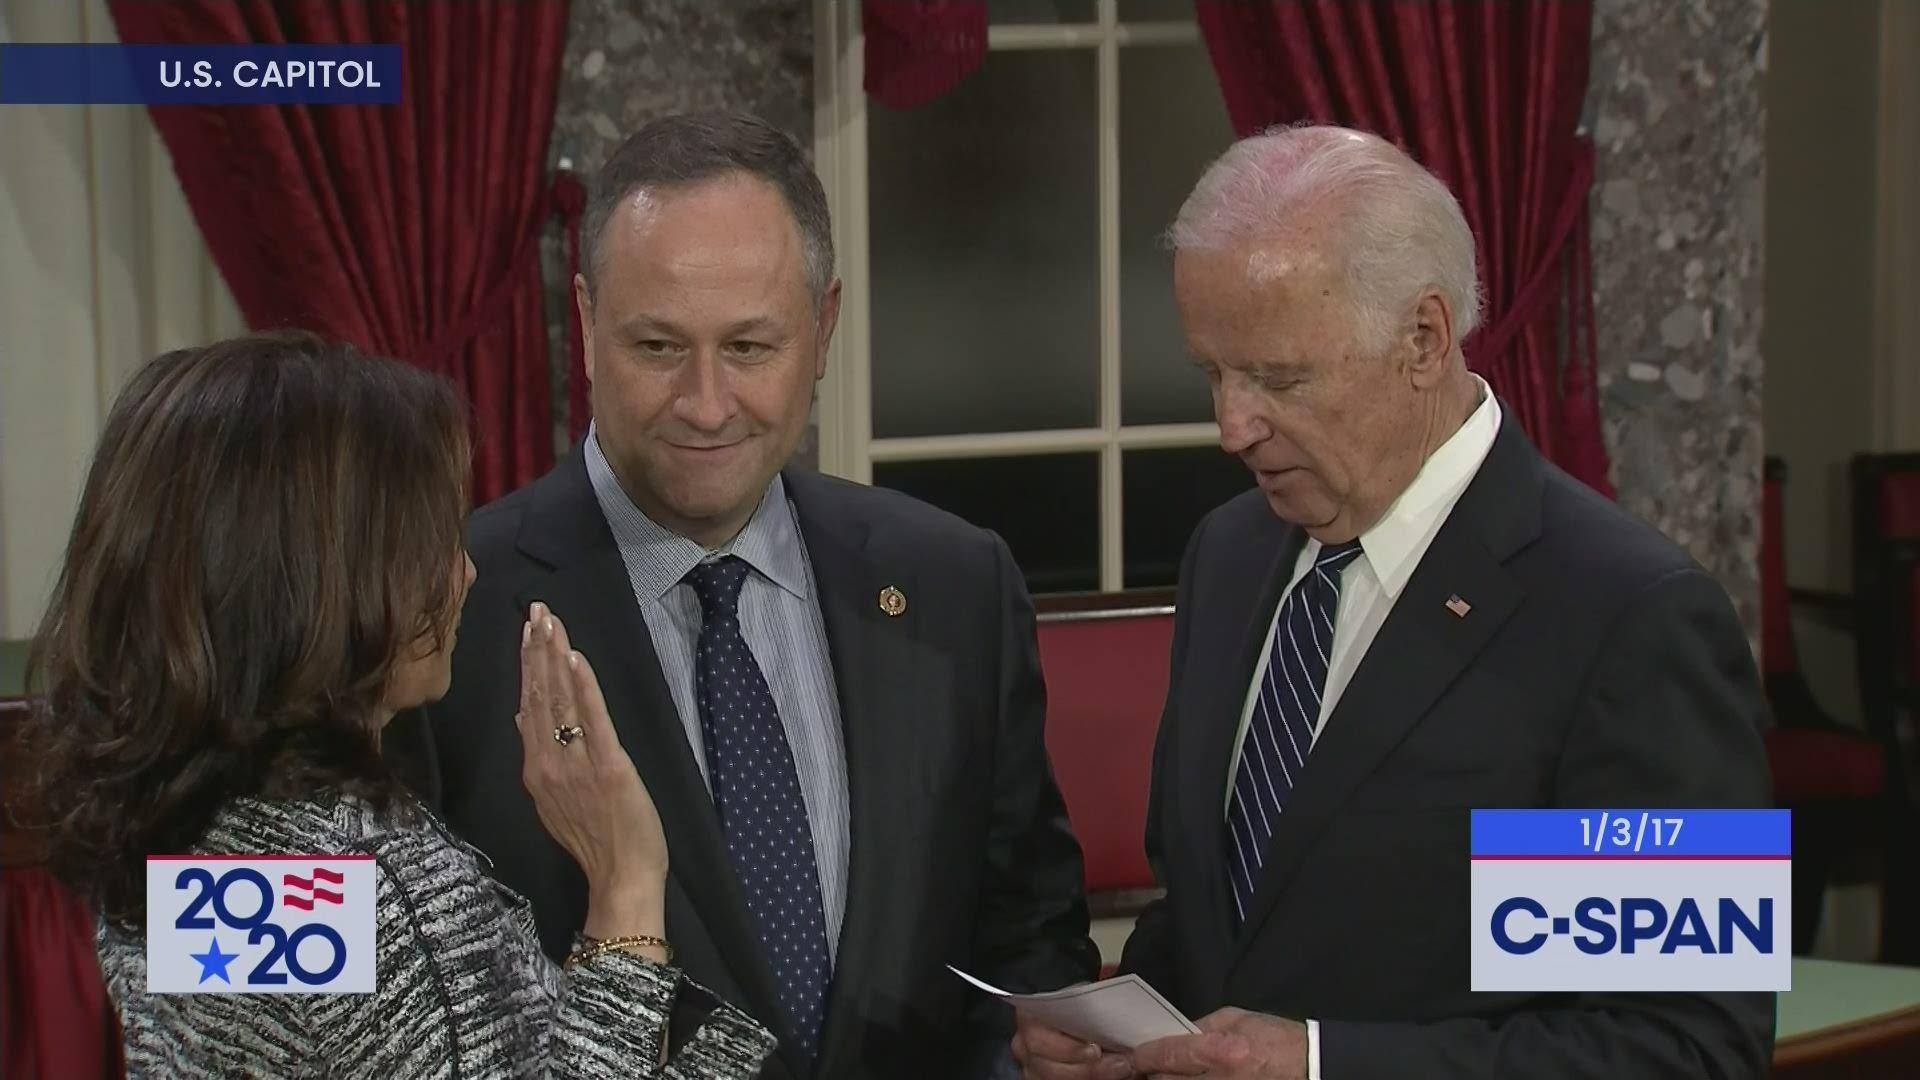 Sen Kamala Harris Sworn In By Vice President Biden C Span Org